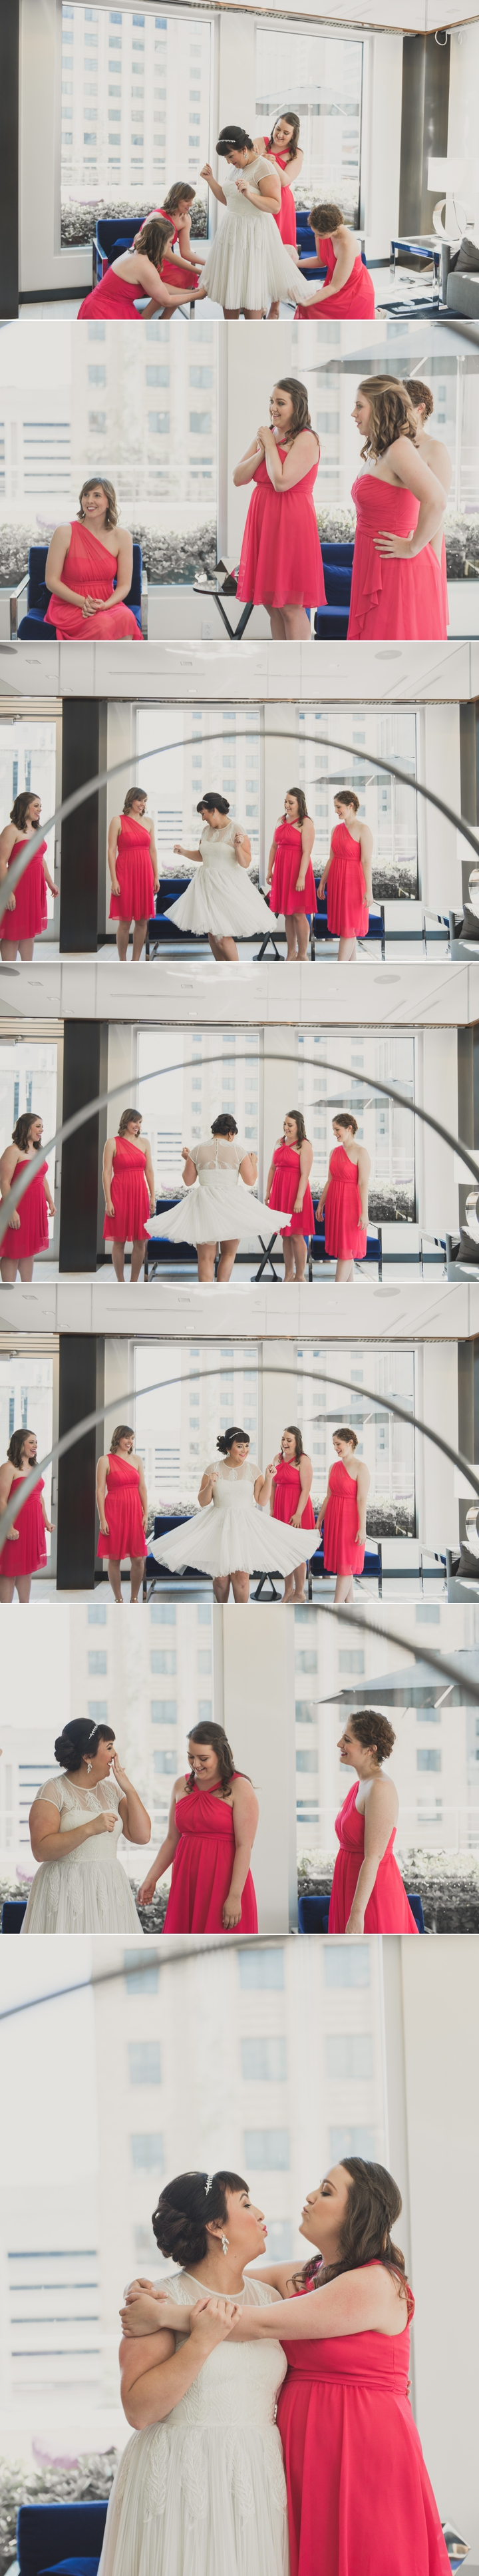 dallas-wedding-photographer-hw 15.jpg